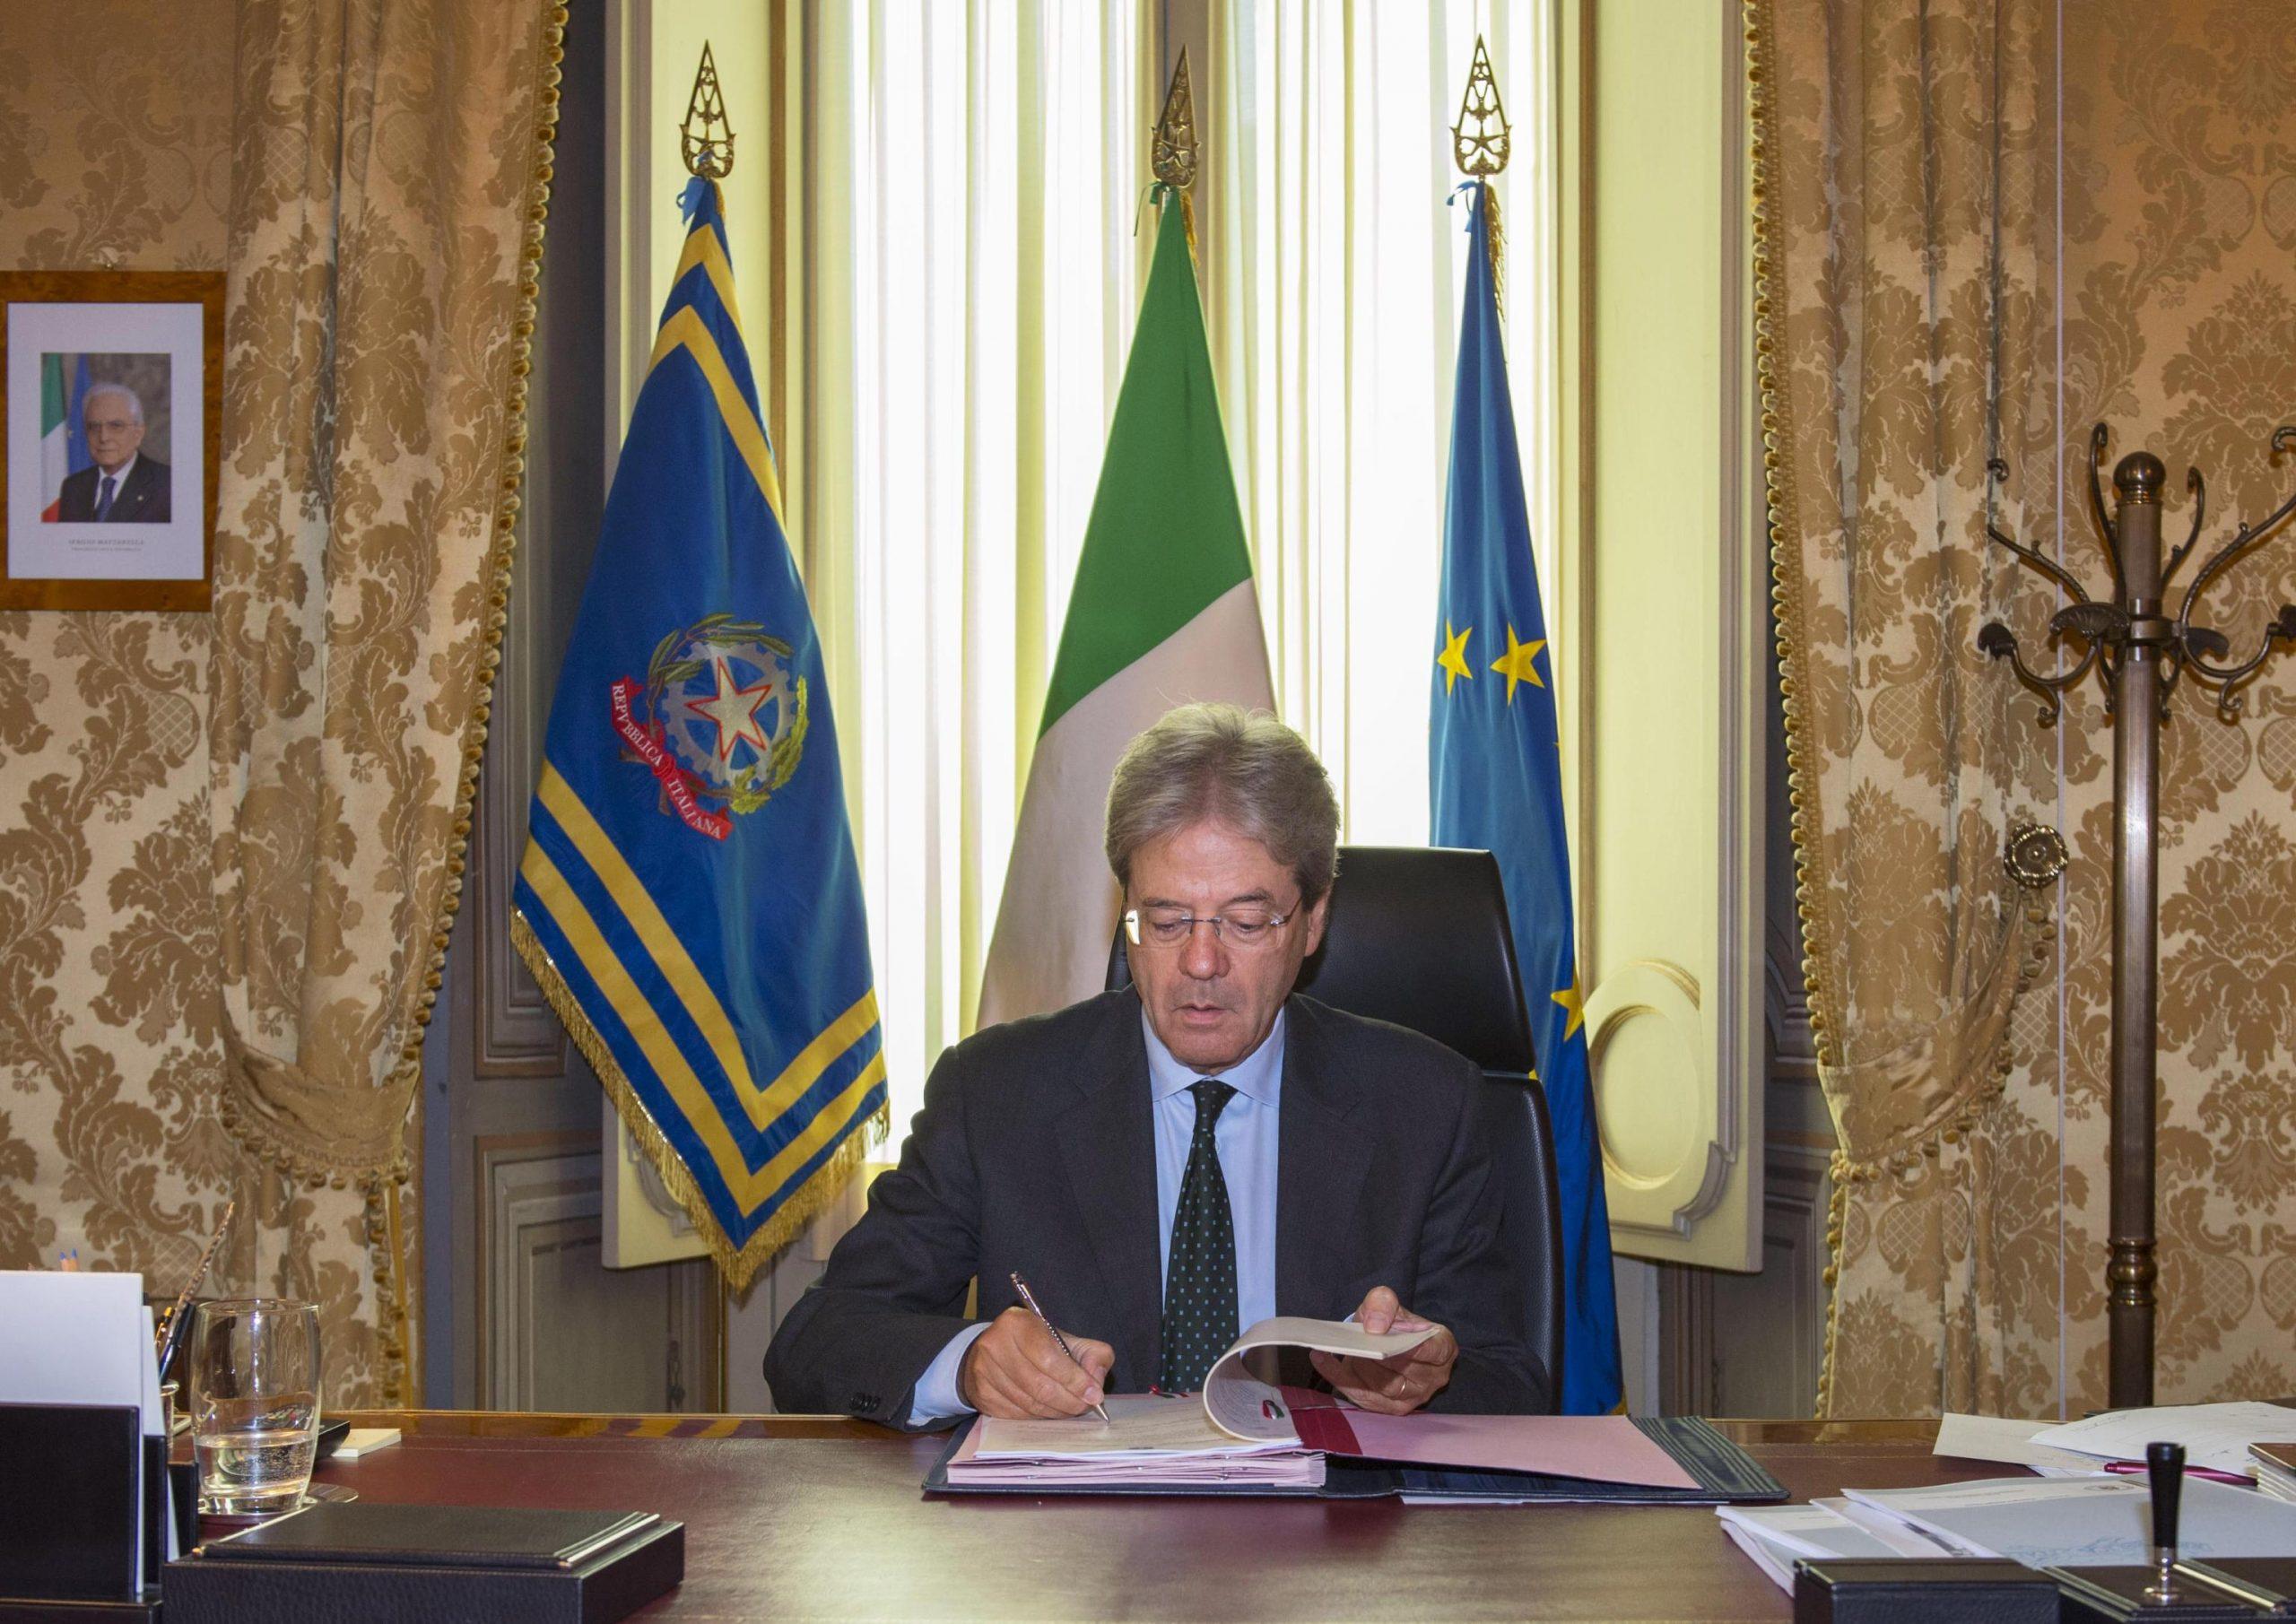 Pensioni: Gentiloni firma decreto su Ape volontaria